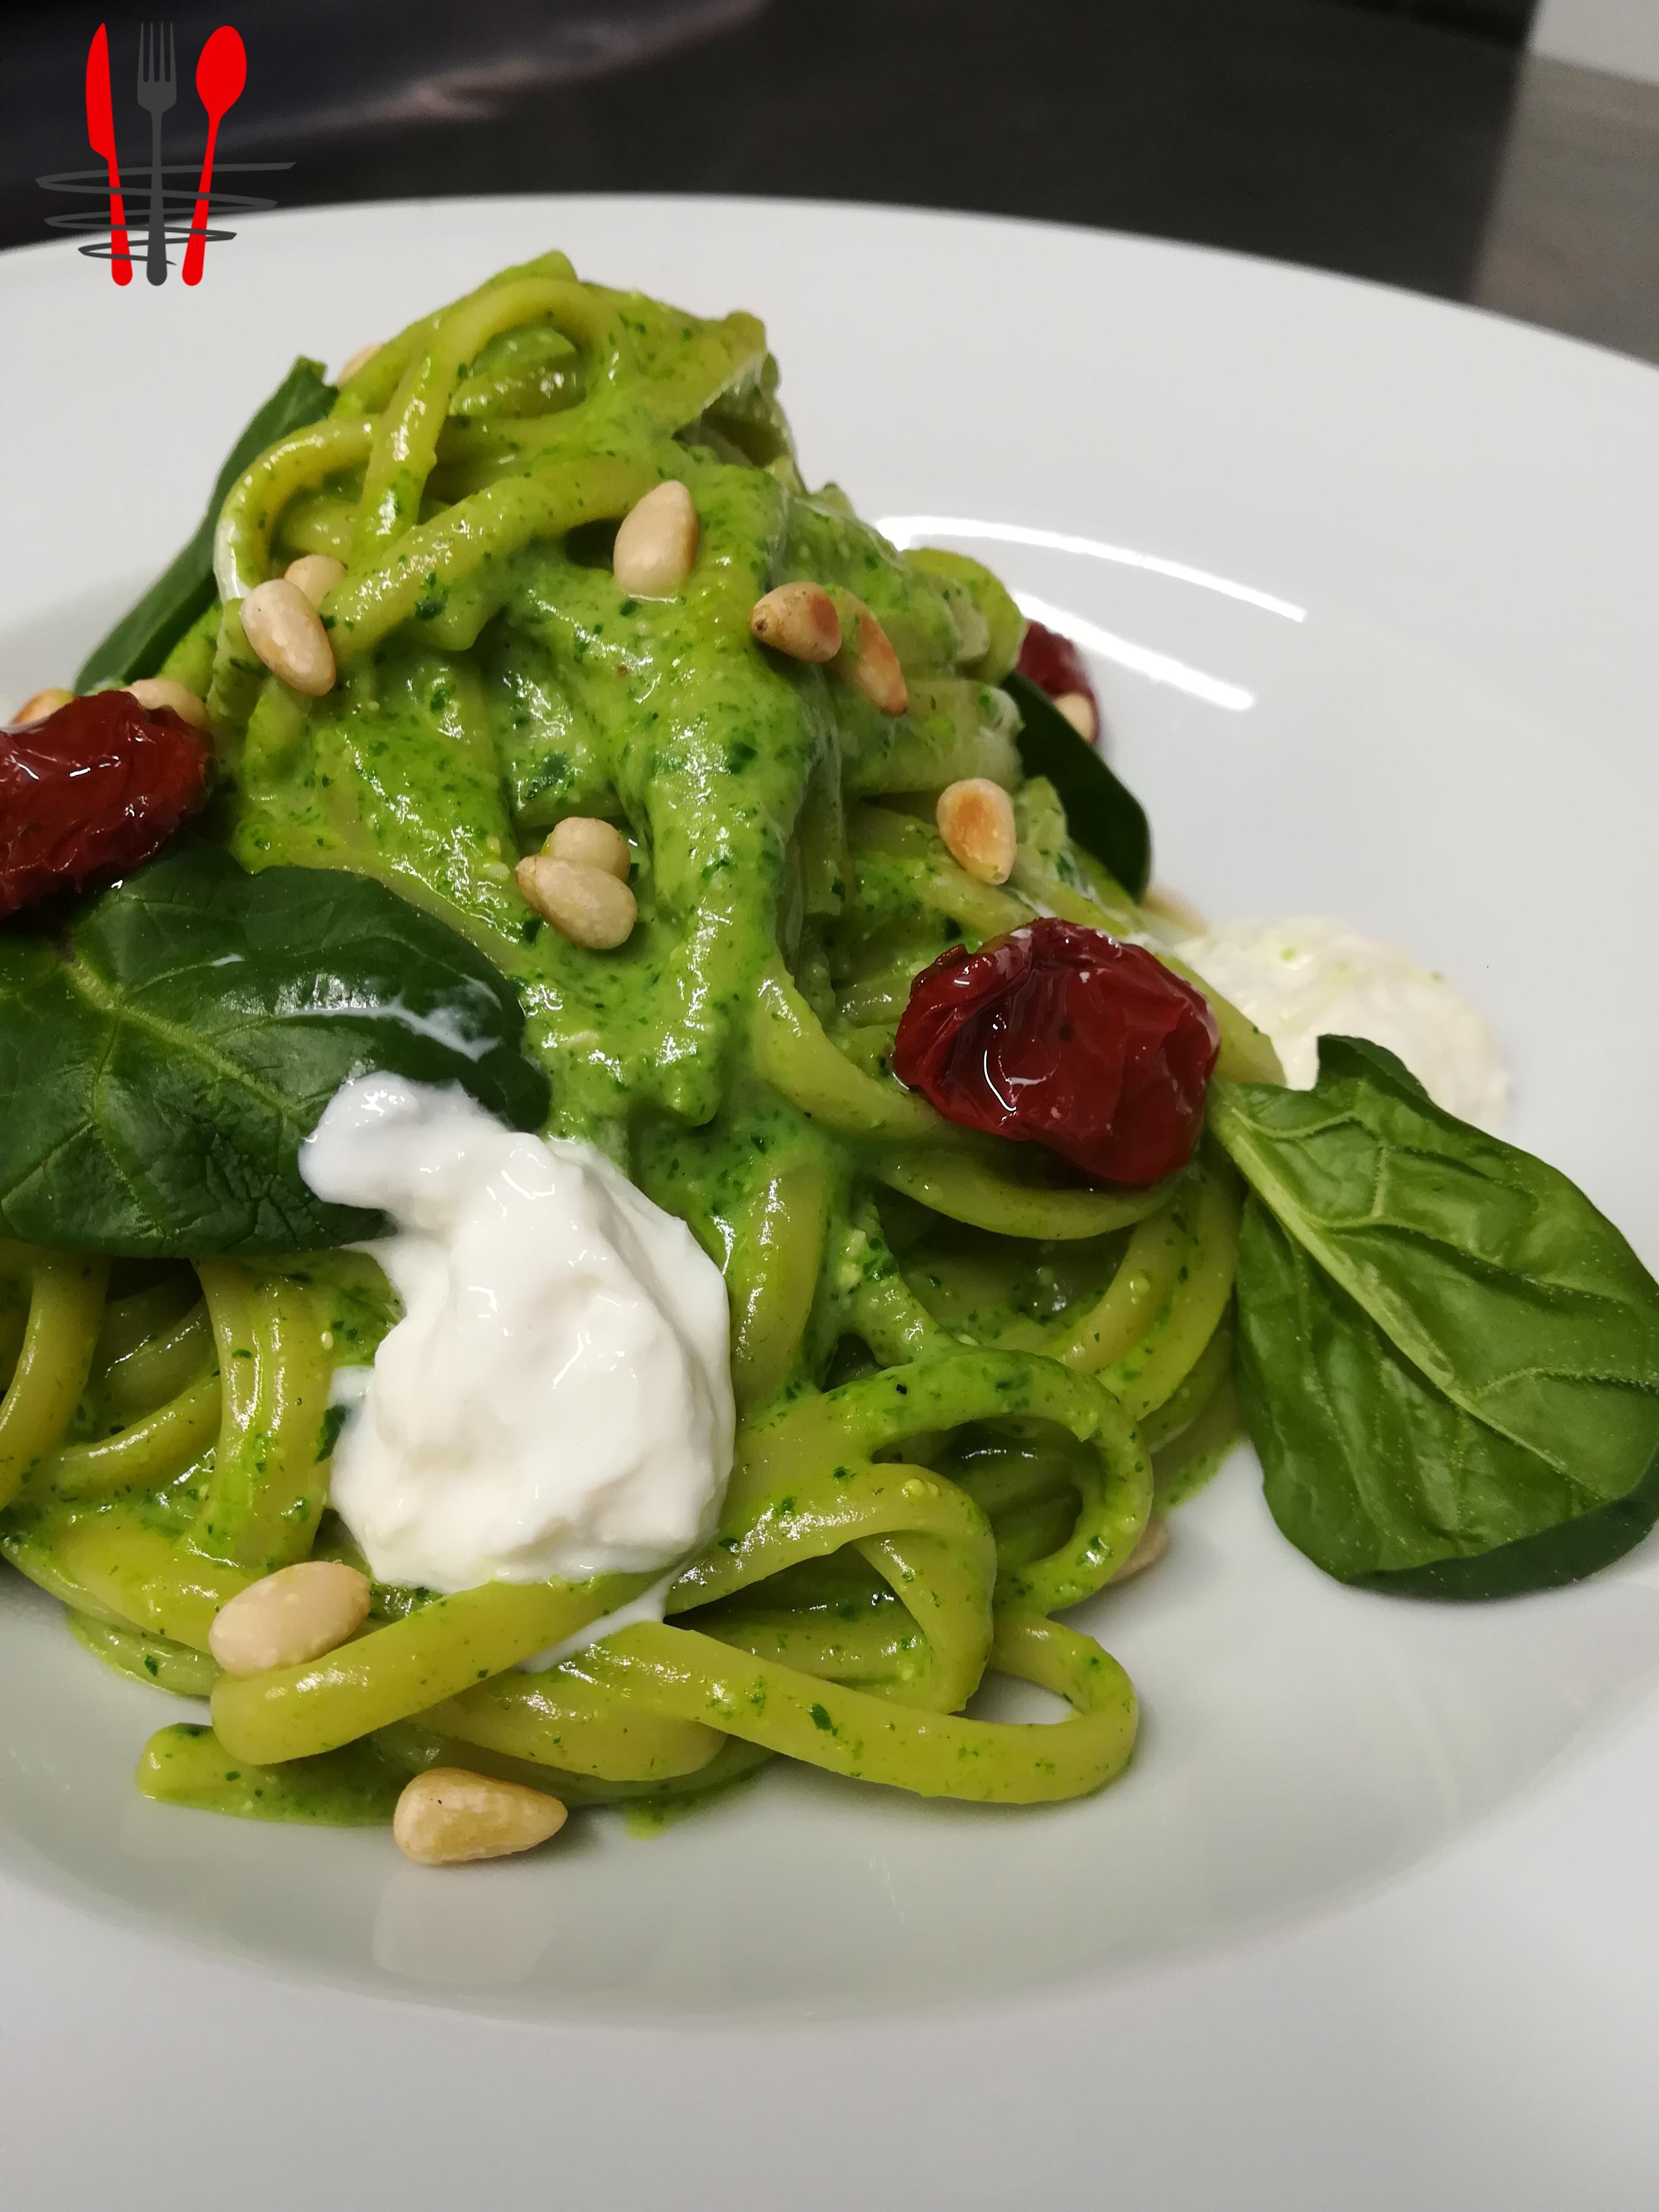 Formateur/consultant restauration italienne